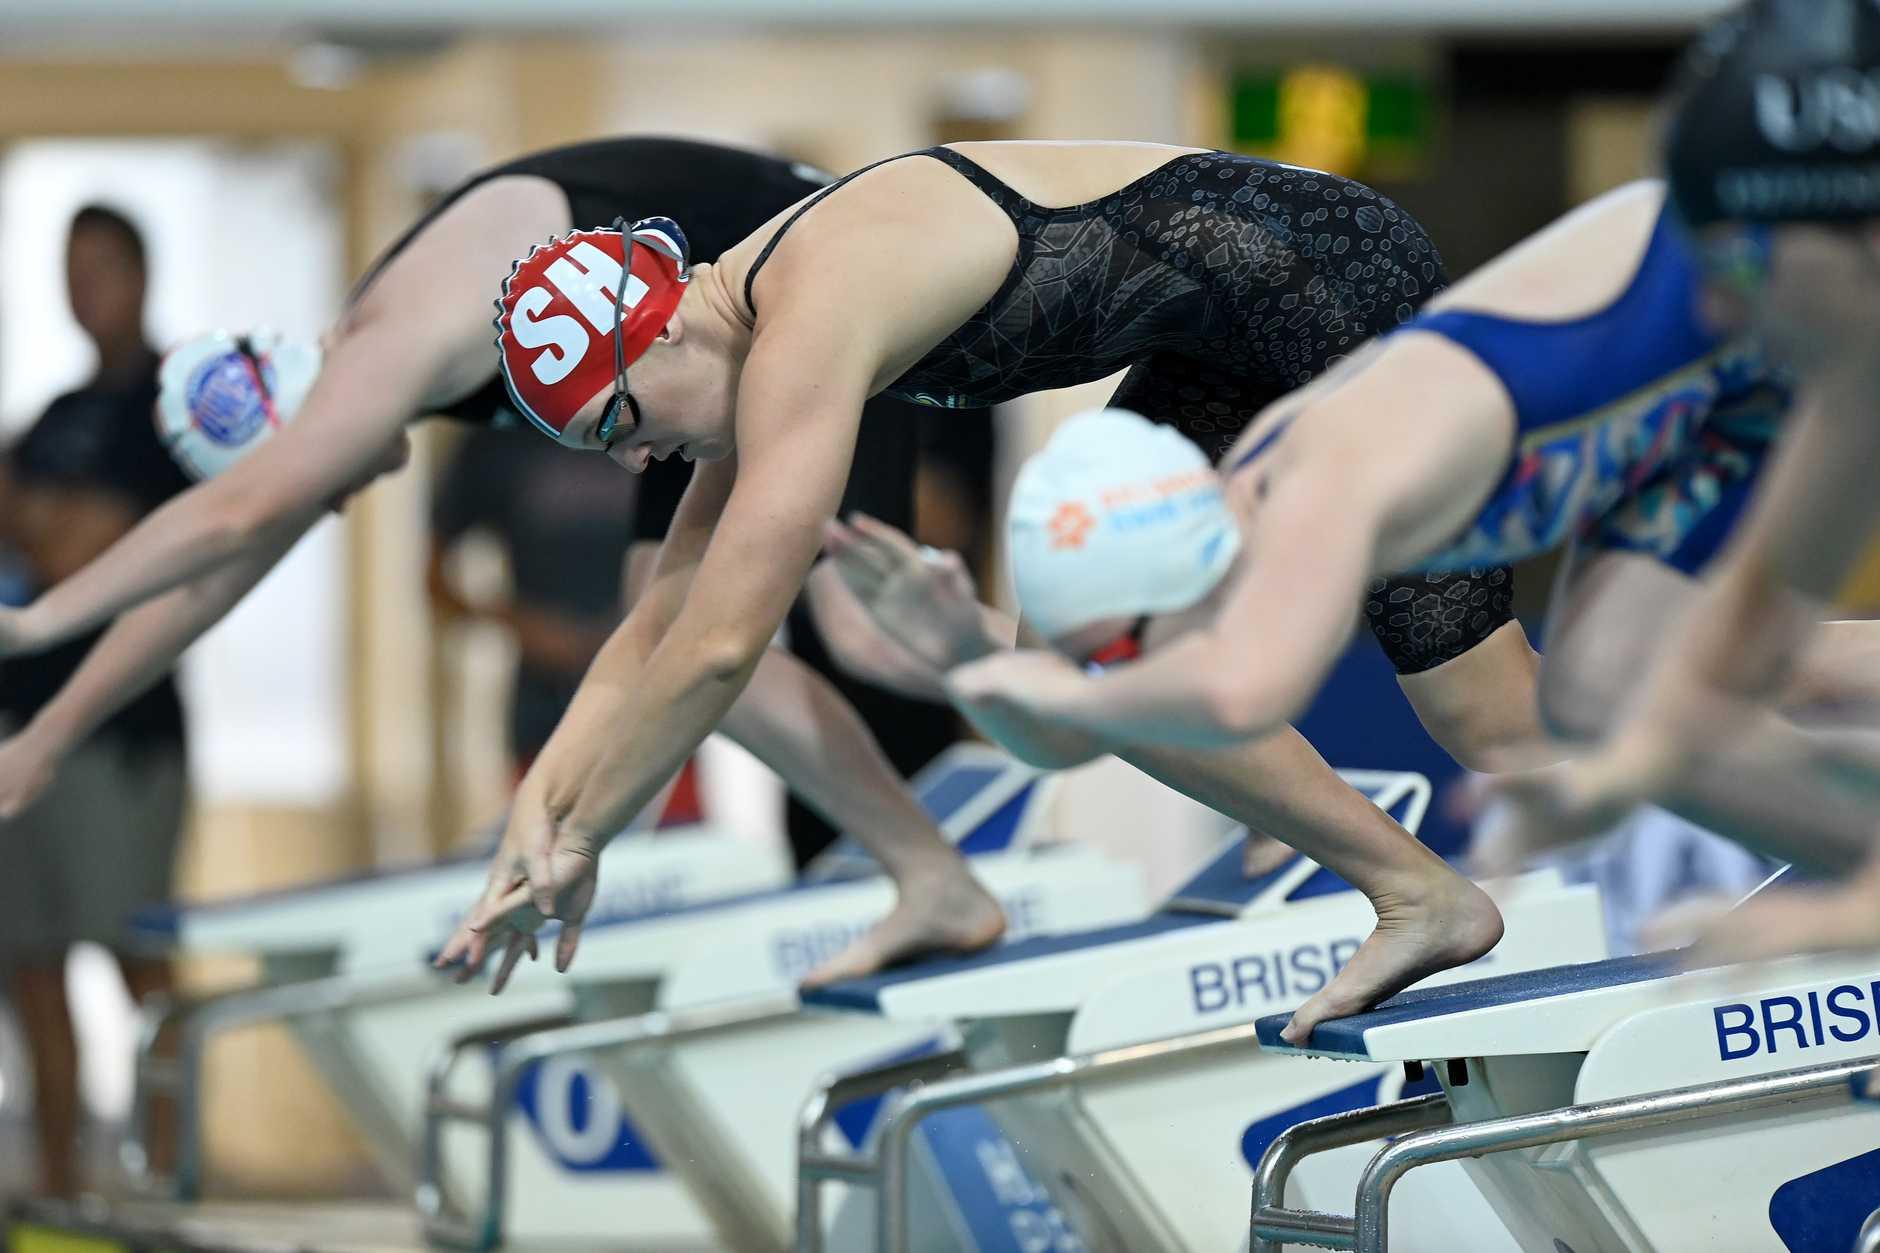 Madeleine McTernan set a new world record during the Australian Virtual Short Course Swimming Championships recently.  (Photo by Bradley Kanaris Photography/Bradley Kanaris)